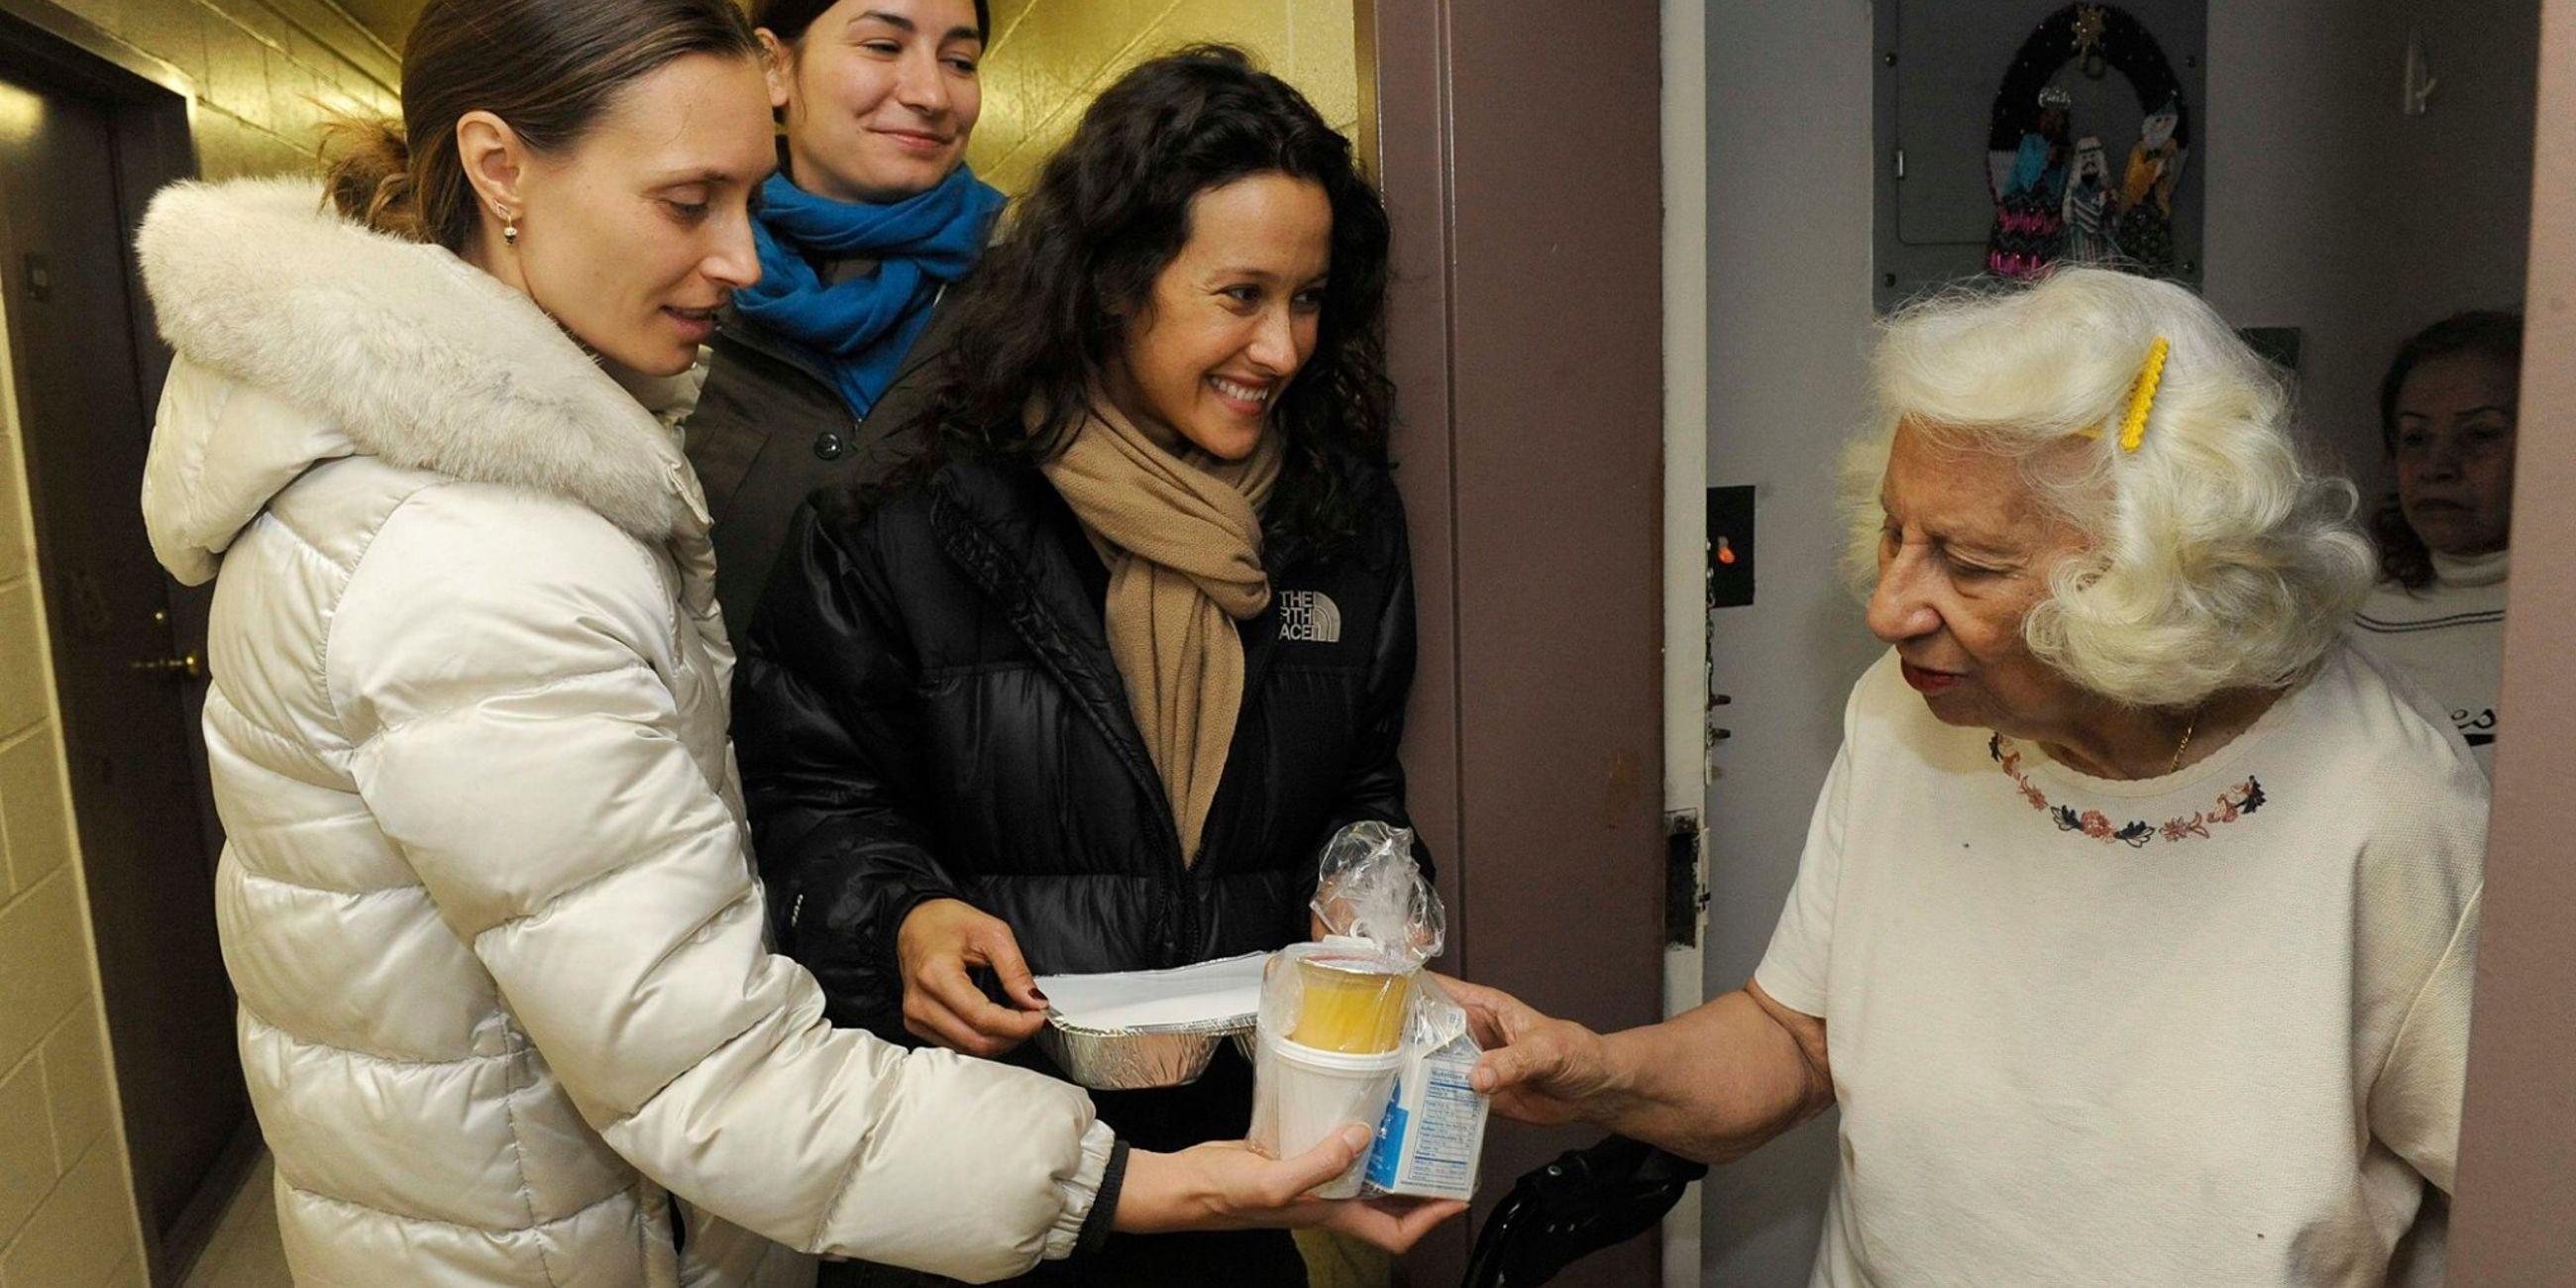 Deliver Hot Meals & Warm Visits to Homebound Seniors